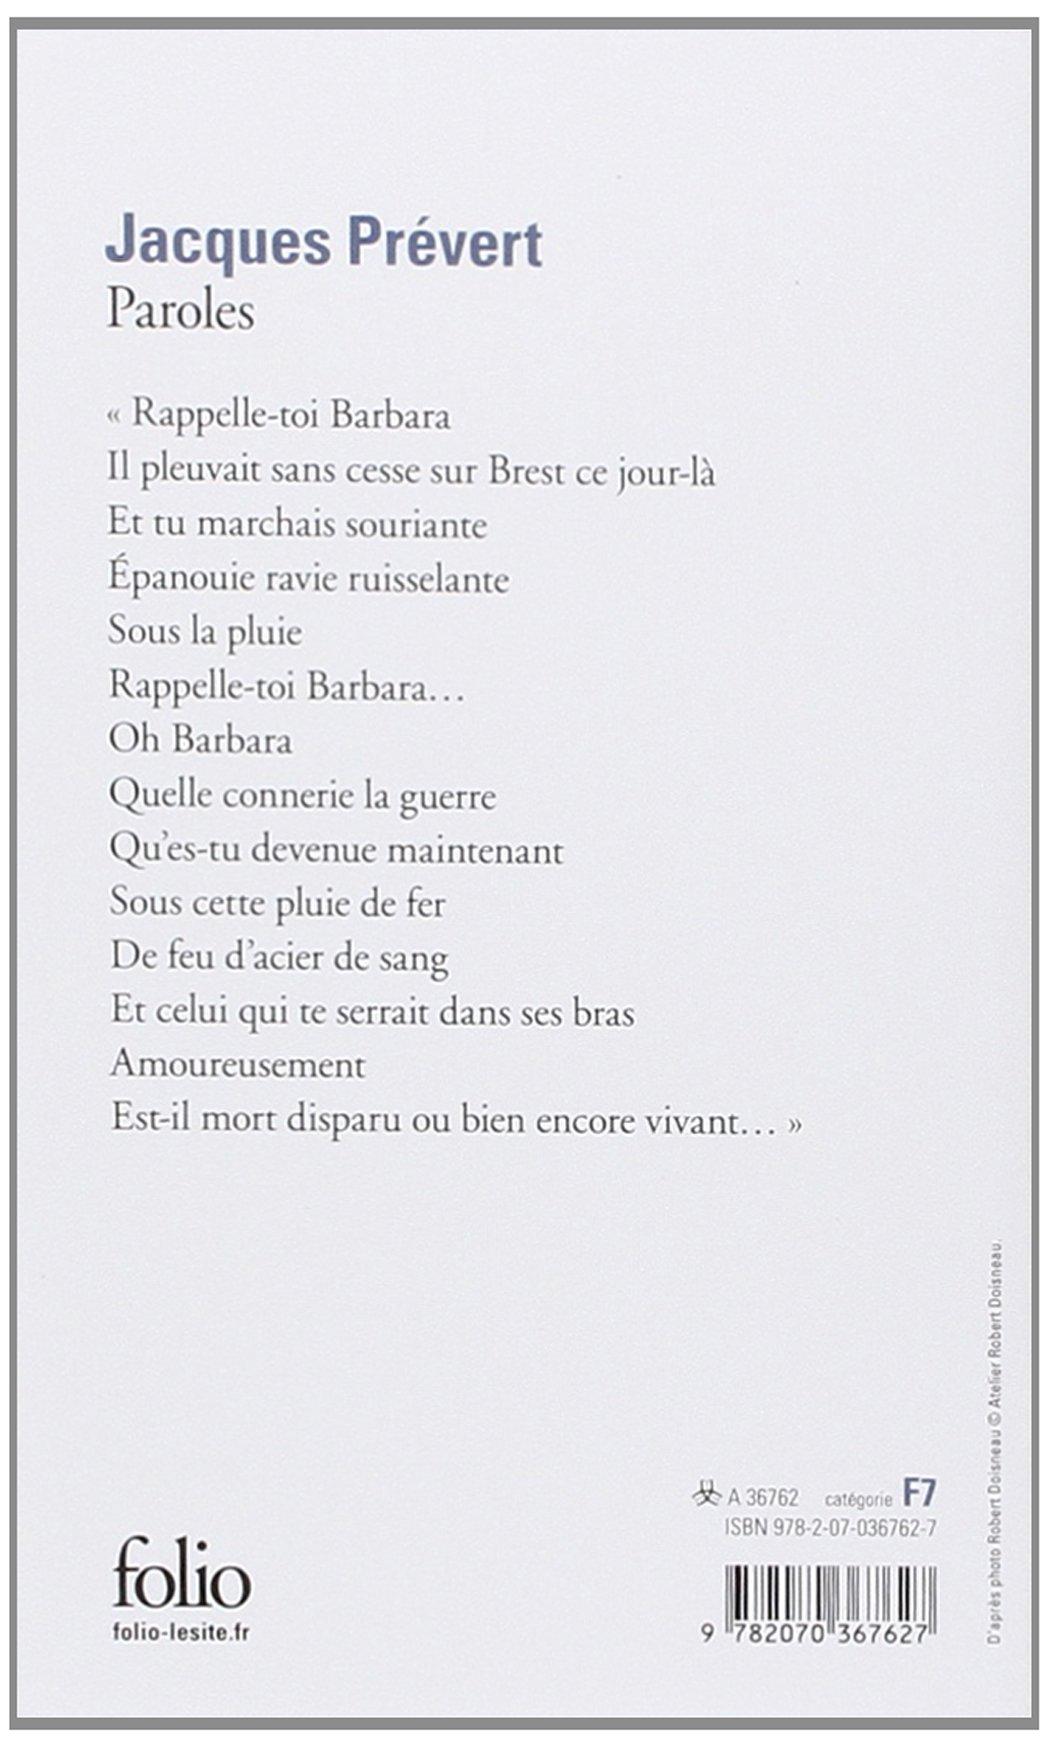 Paroles Folio Amazones Jacques Prevert Libros En